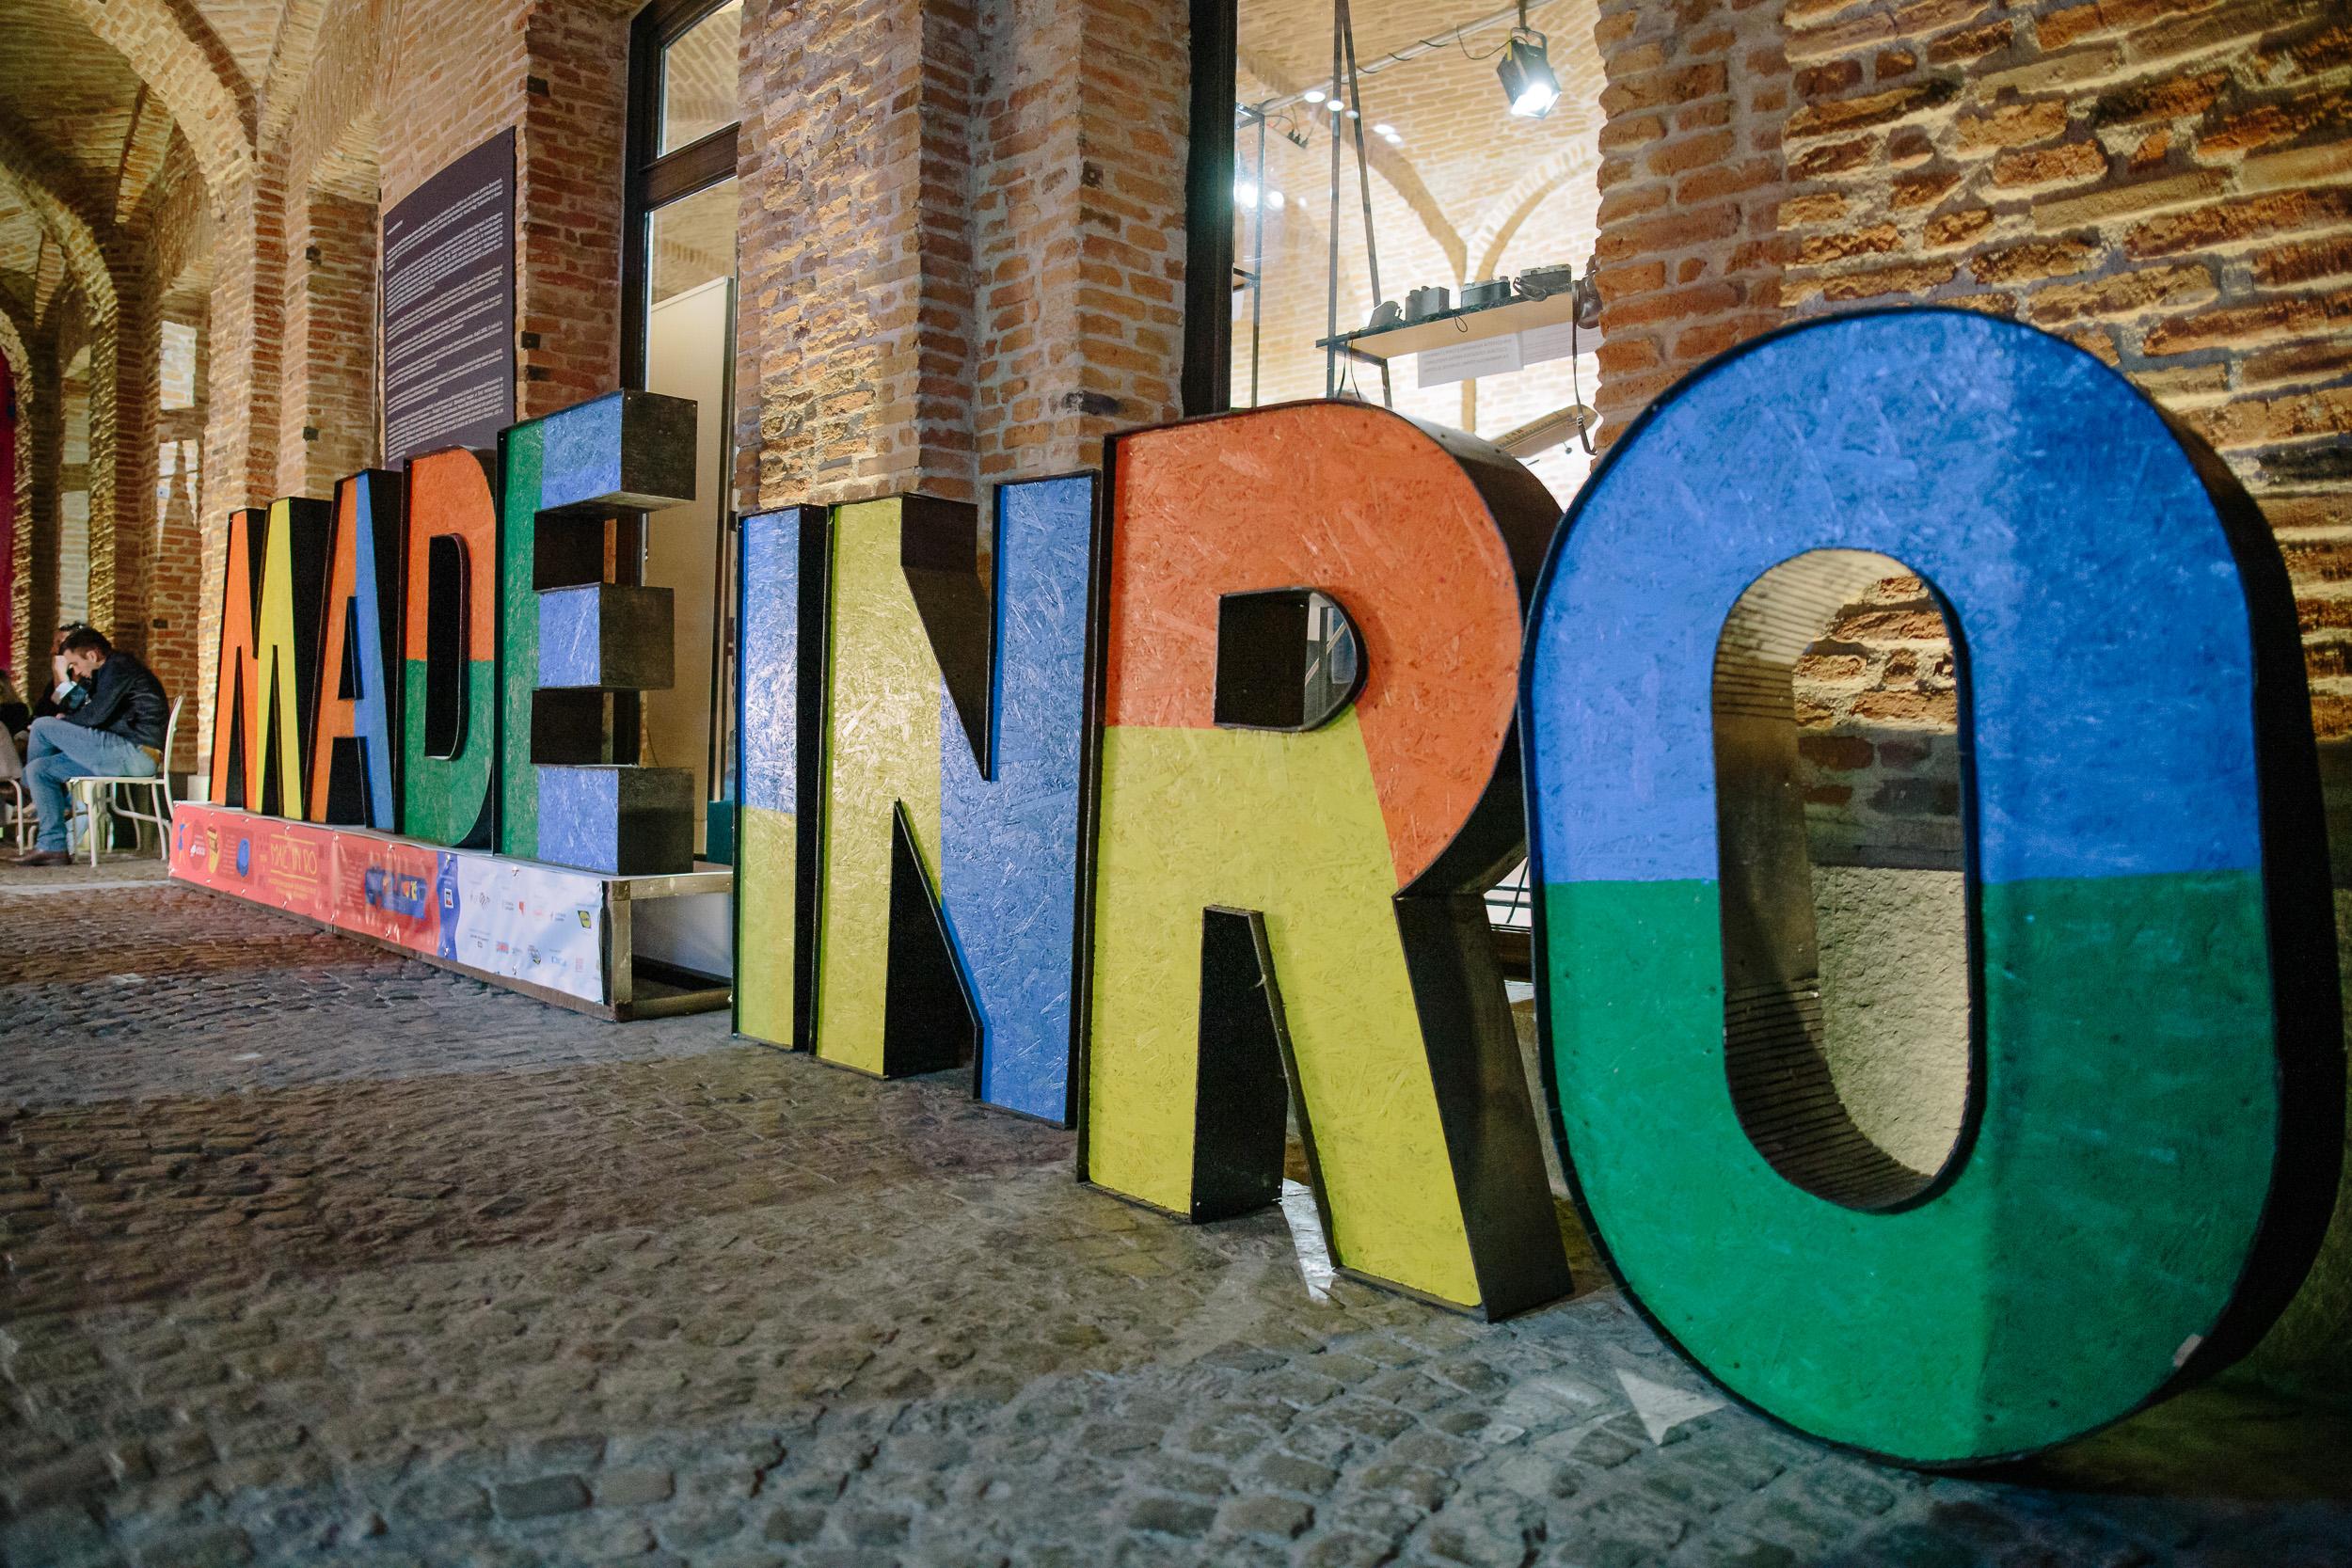 Made in RO: muzeu temporar de publicitate si branduri romanesti